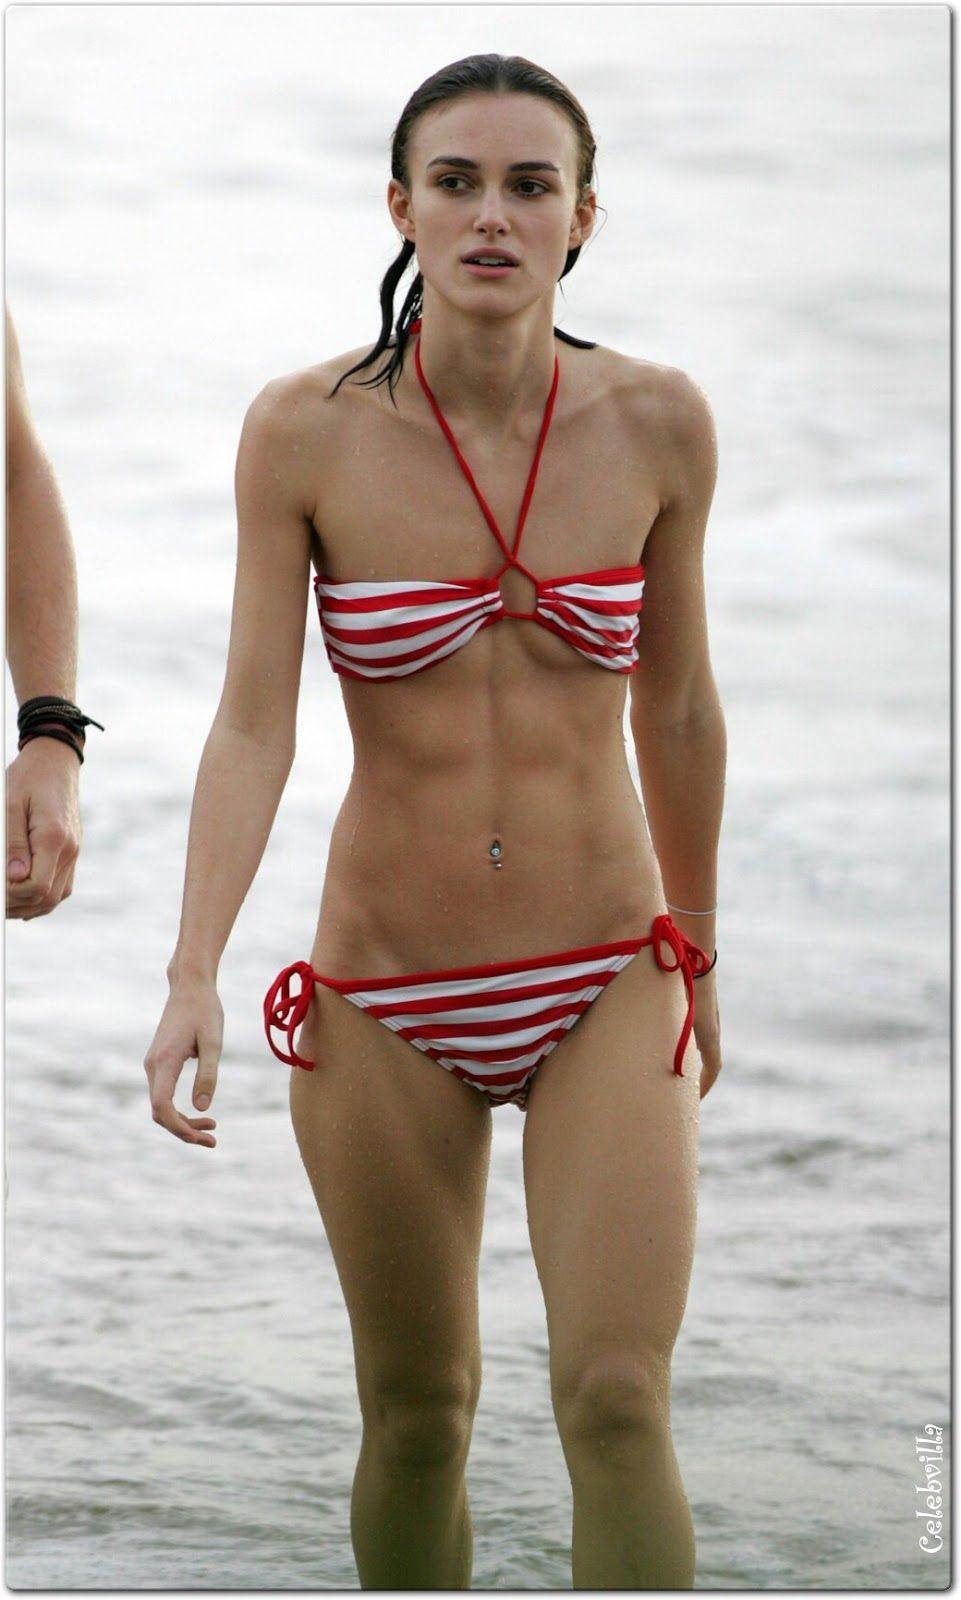 Keira knightley swimsuit